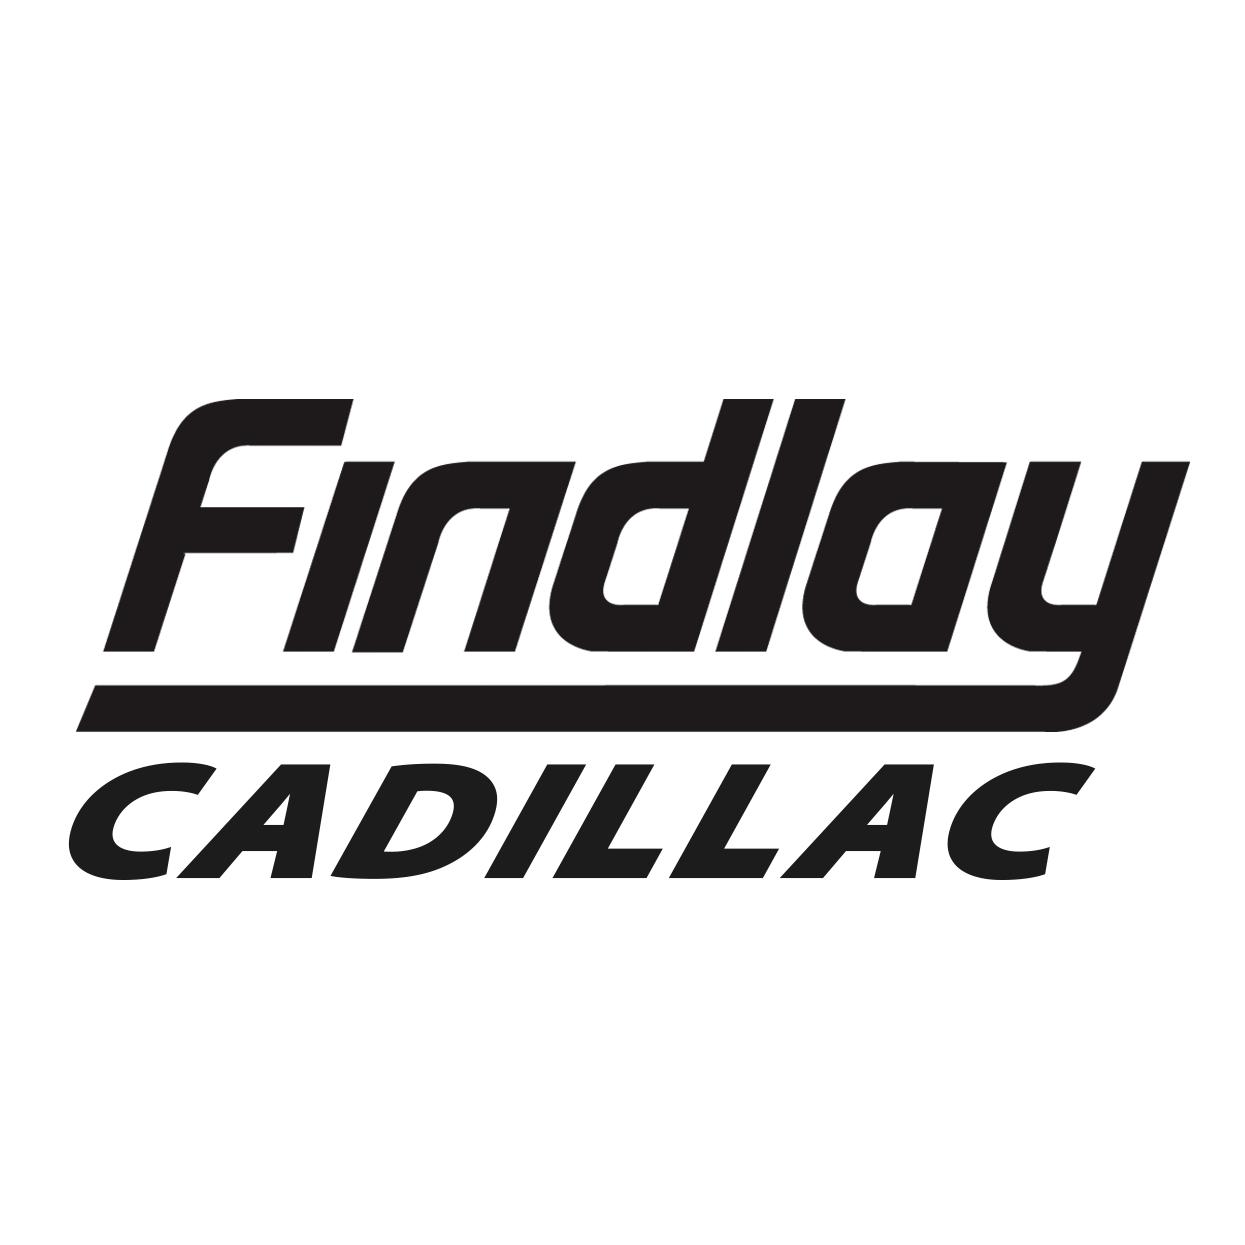 Findlay Cadillac 993 Auto Show Dr Henderson Nv Auto